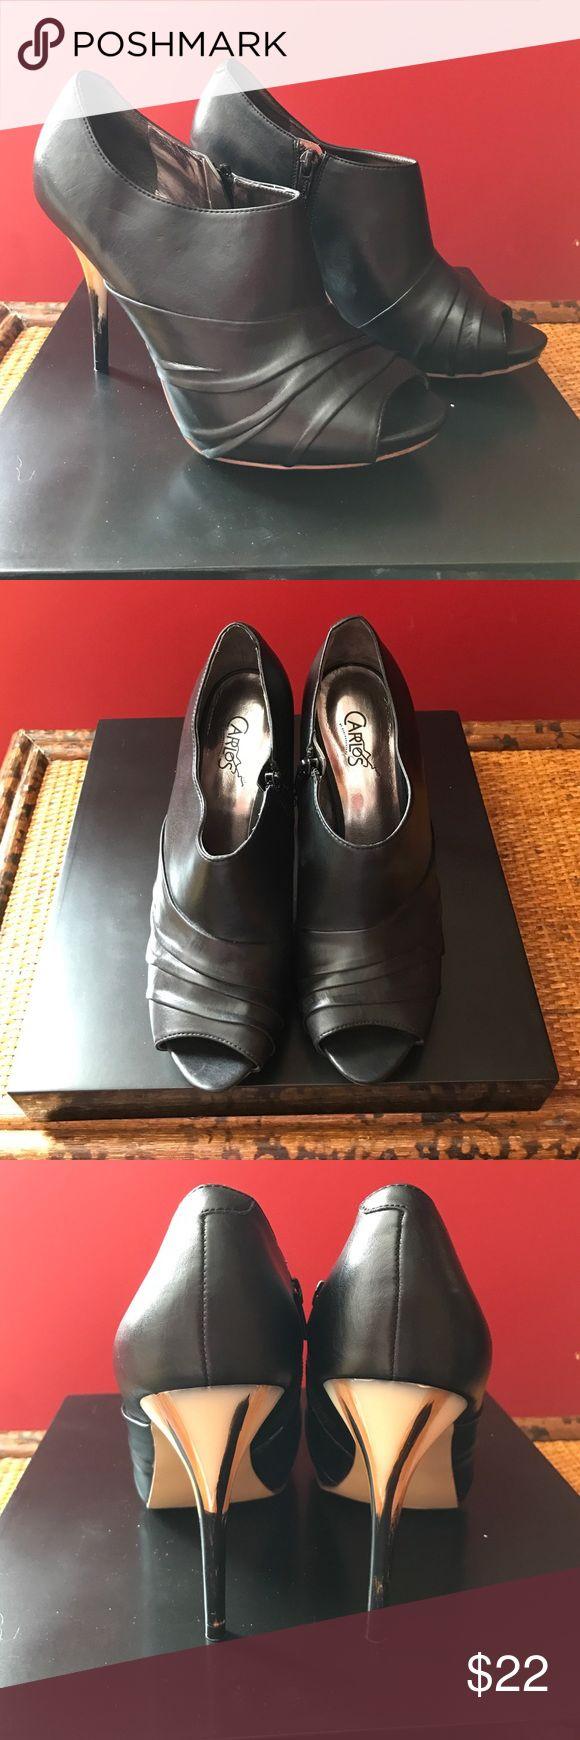 Carlos Santana Heeled Bootie Carlos Santana Black Open-toed bootie with decorative Heel Size 8 Carlos Santana Shoes Ankle Boots & Booties